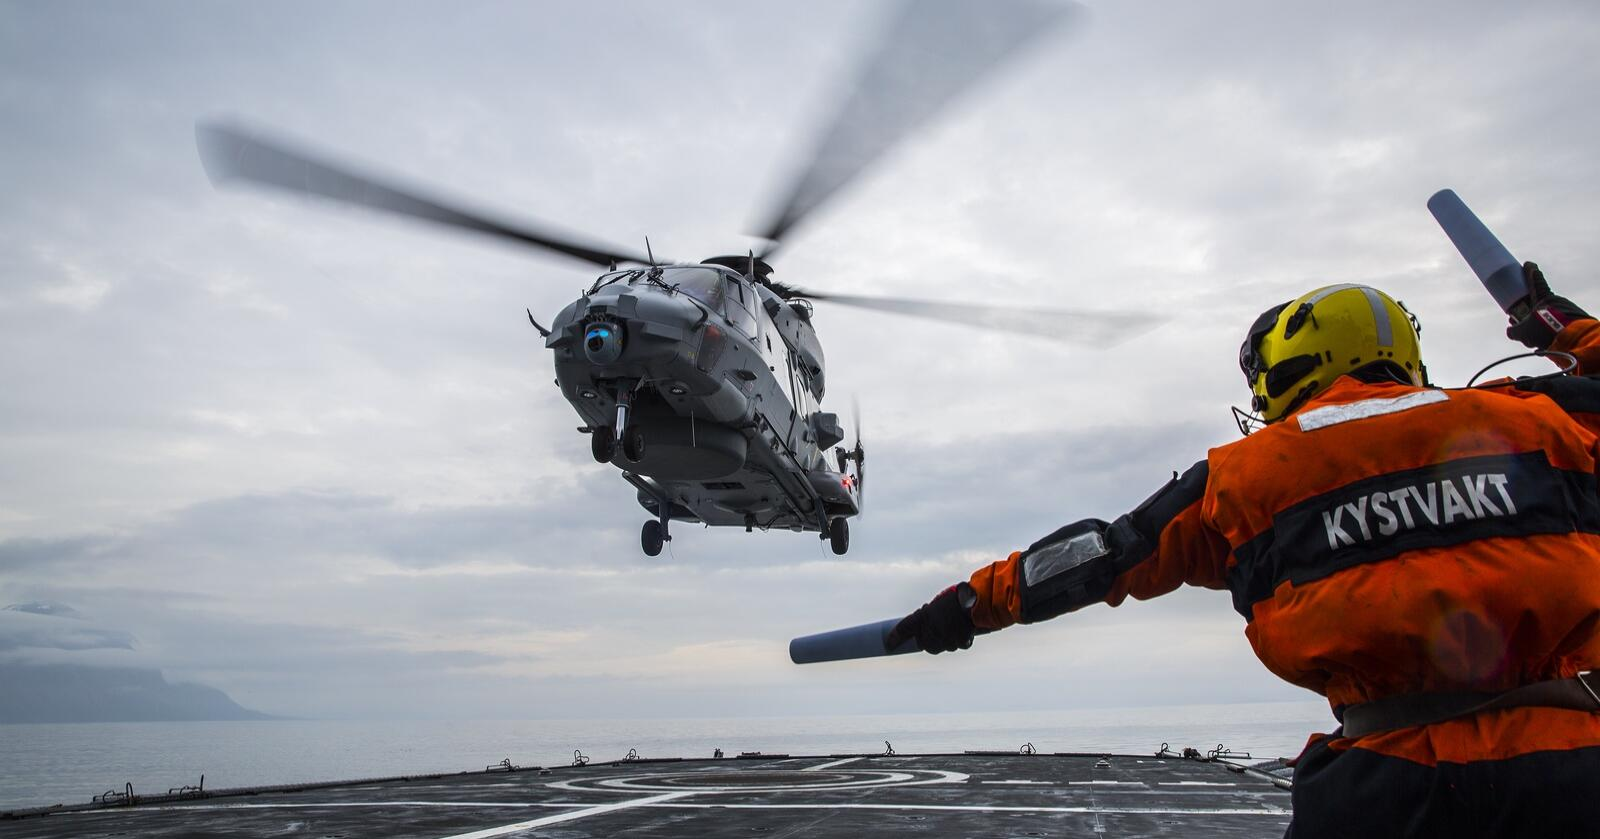 Fortsatte forsinkelser for helikopteret NH-90 skaper problemer for Kystvakta. I fjor ble det bare 67 timer operativ flytid fra kystvaktfartøy, og fra oktober 2020 har det stått stille. Foto: Mats Grimsæth/ Forsvaret